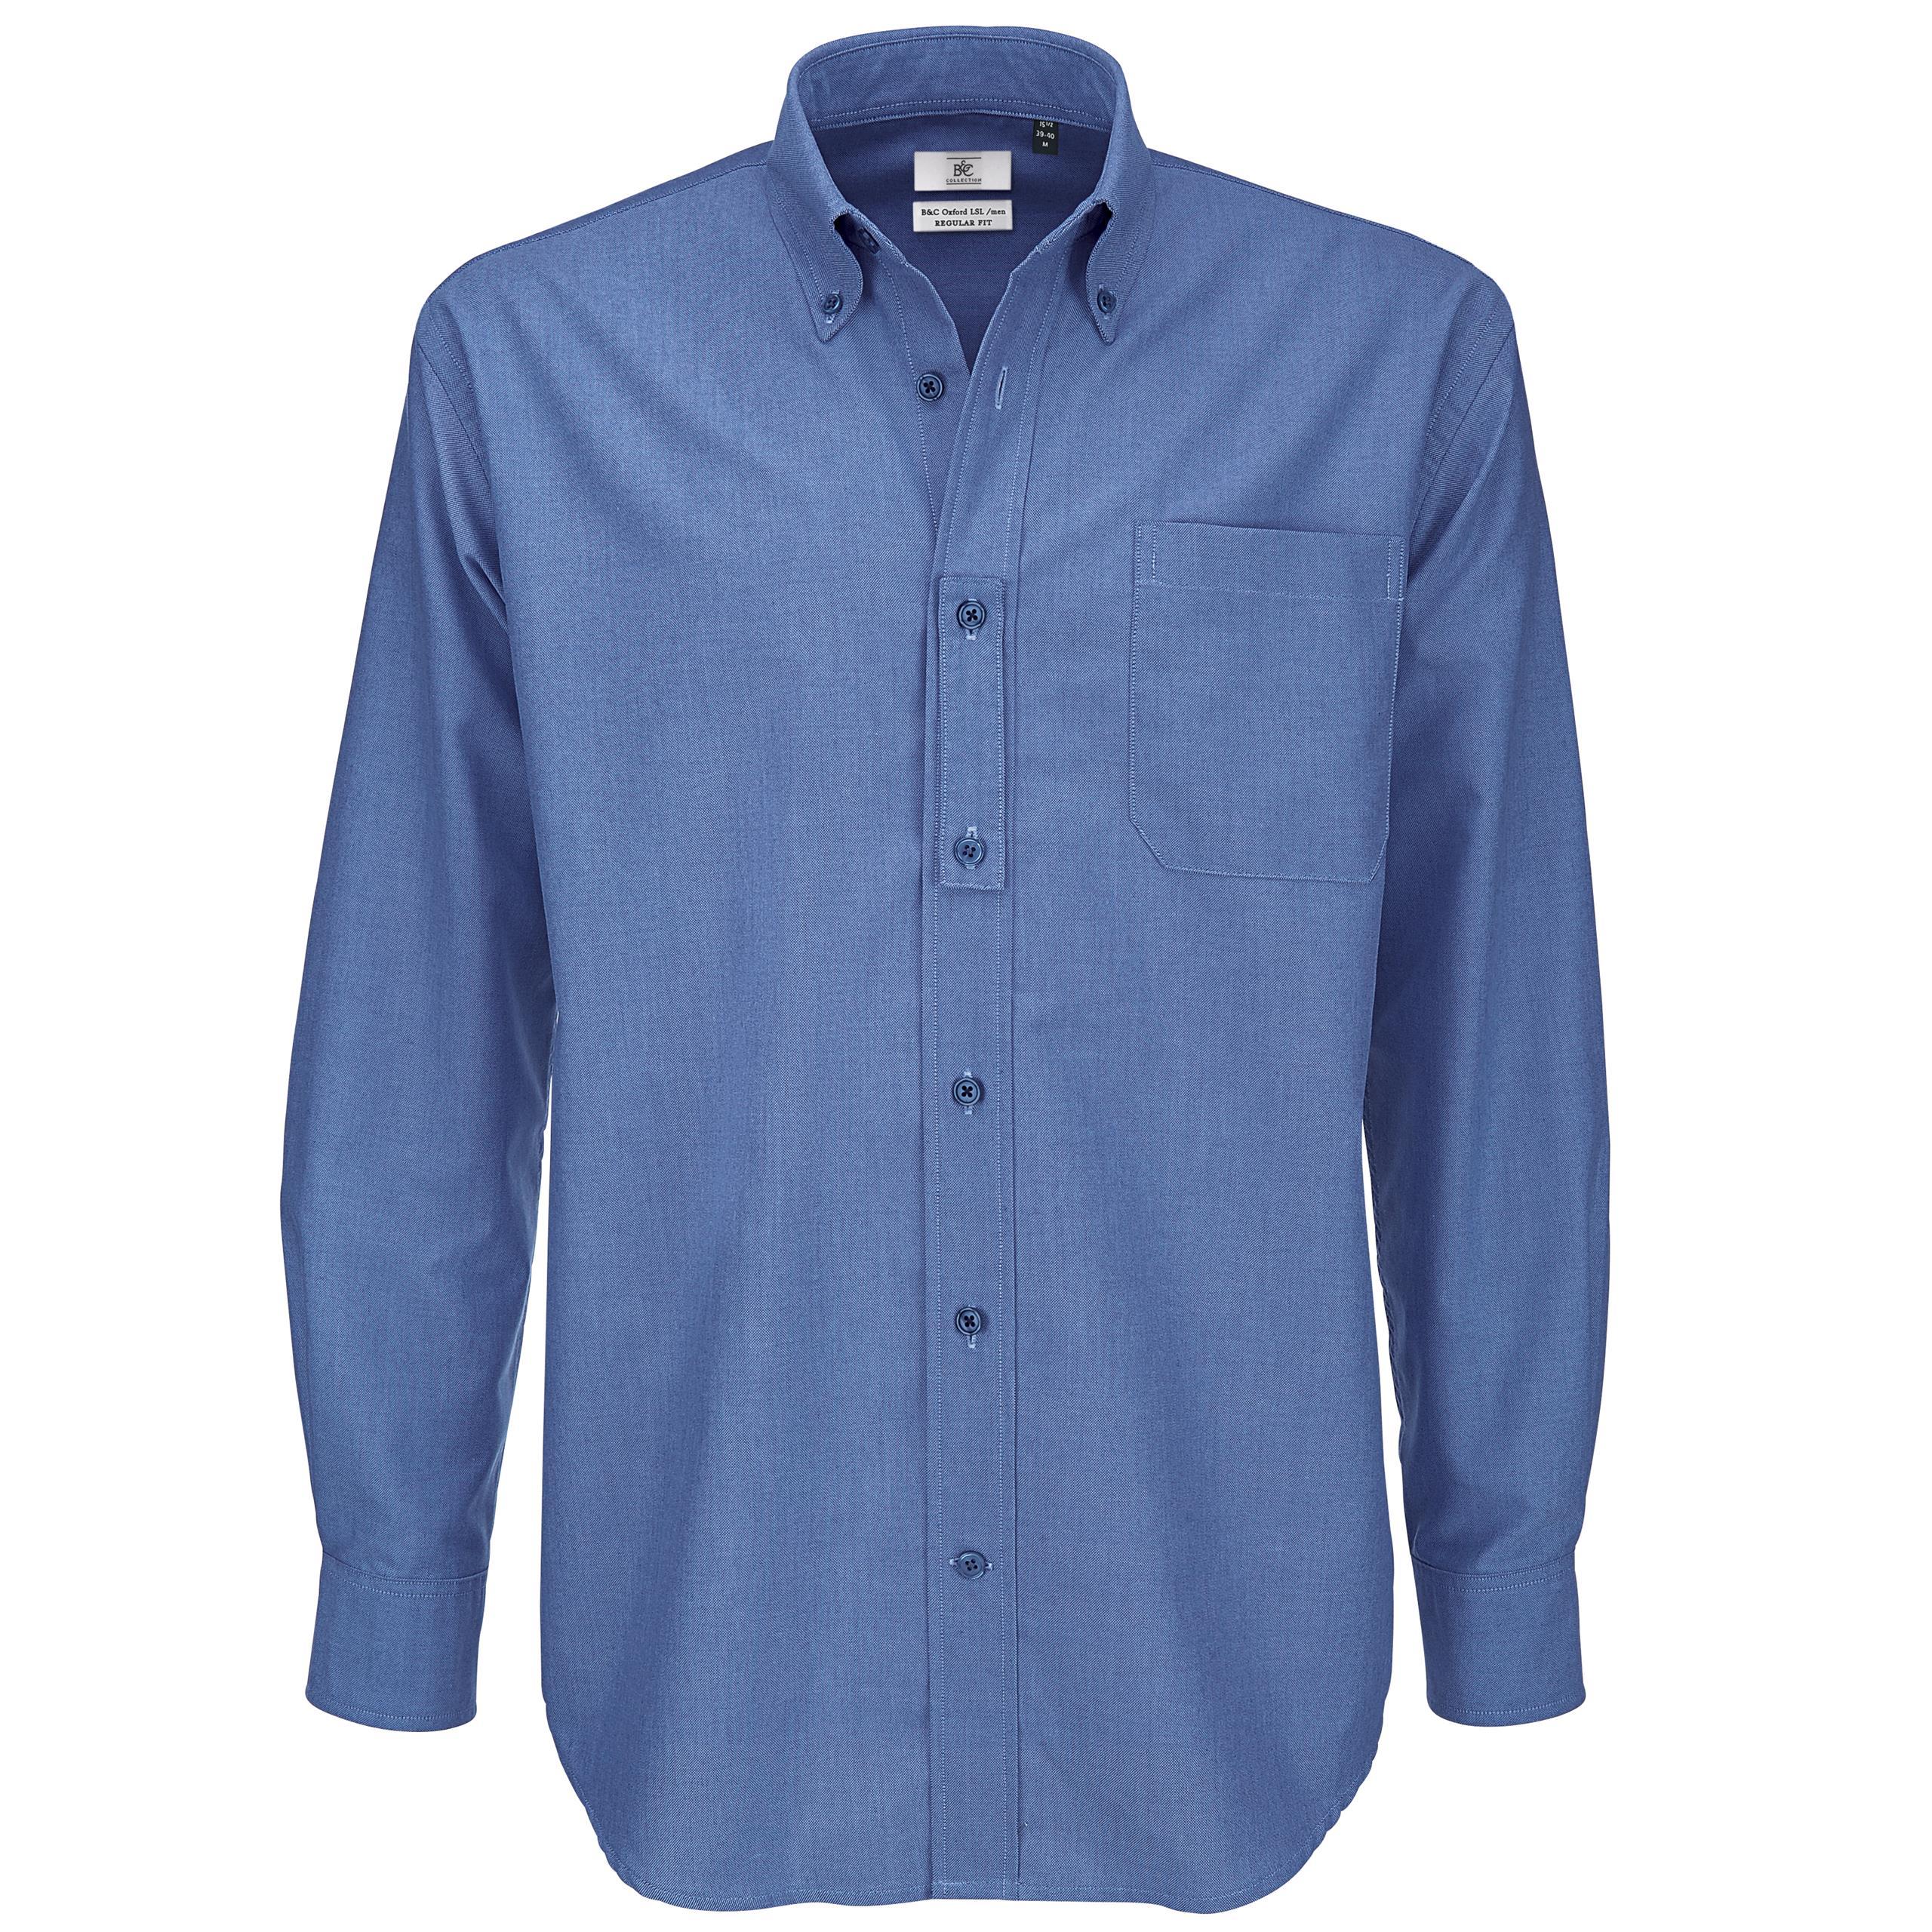 9396d182f Men B&C Collection Button Down Collar Long Sleeve Formal Shirt Top ...